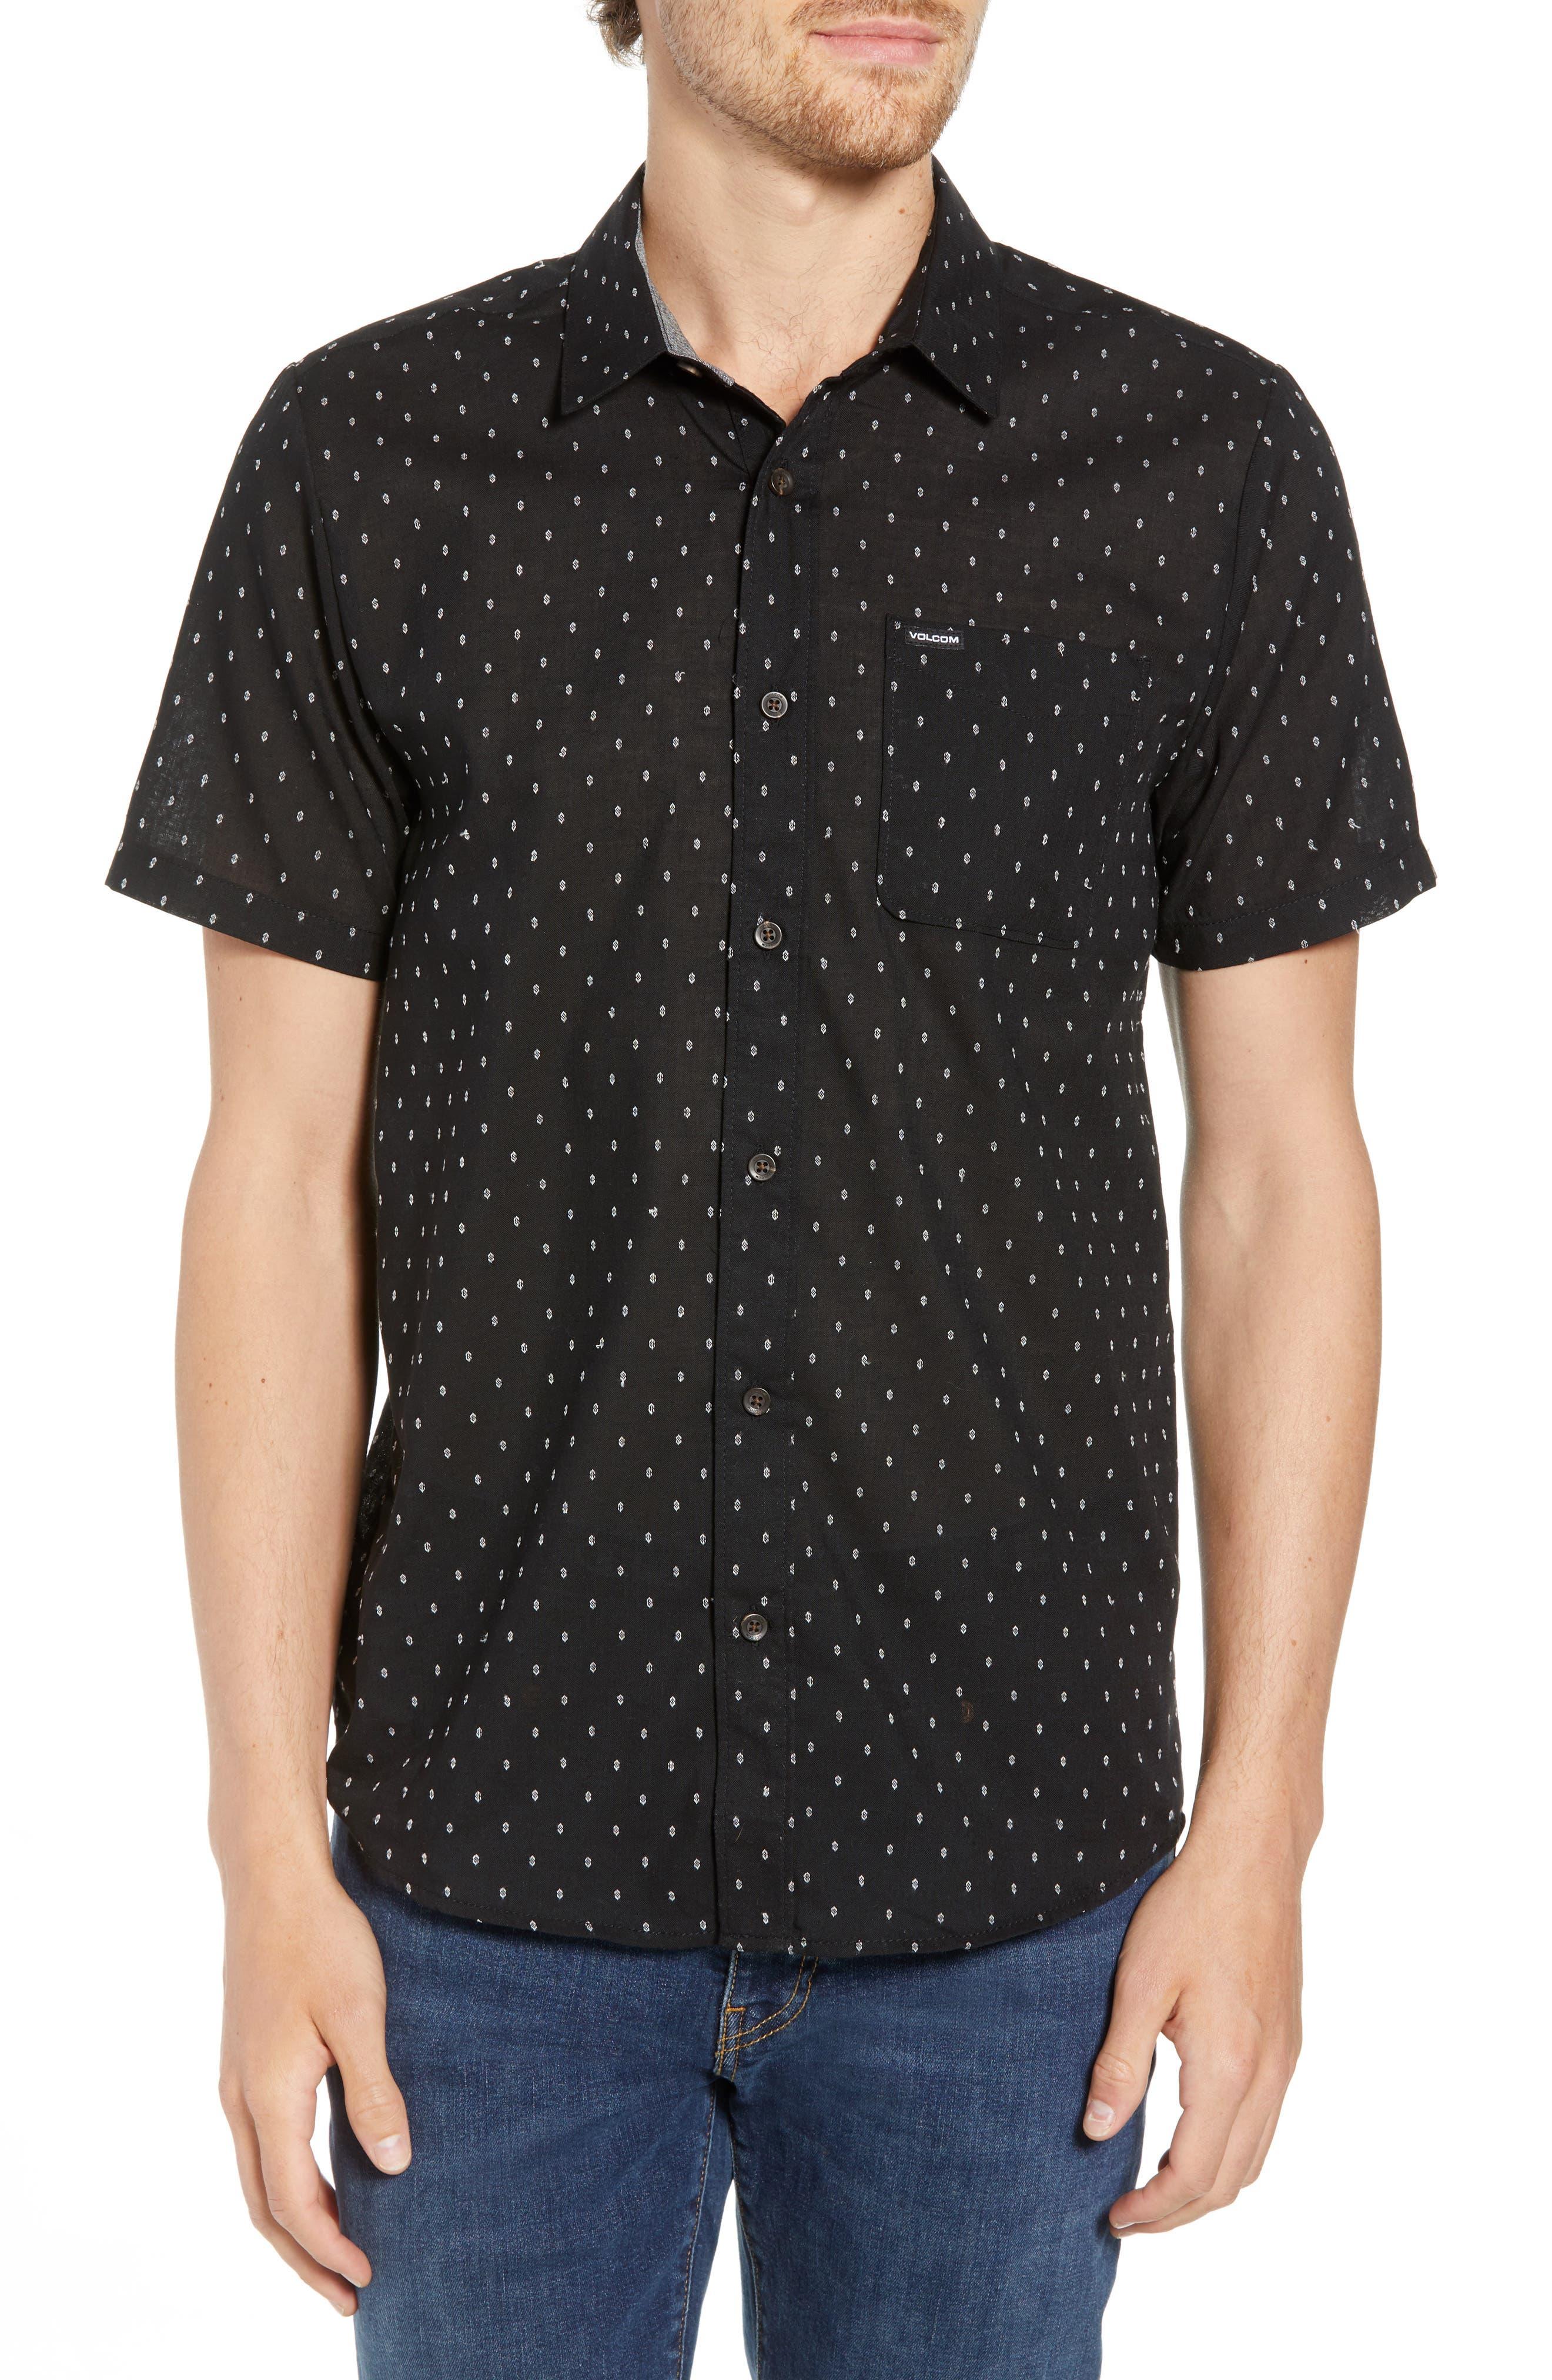 Dobler Woven Shirt,                             Main thumbnail 1, color,                             001